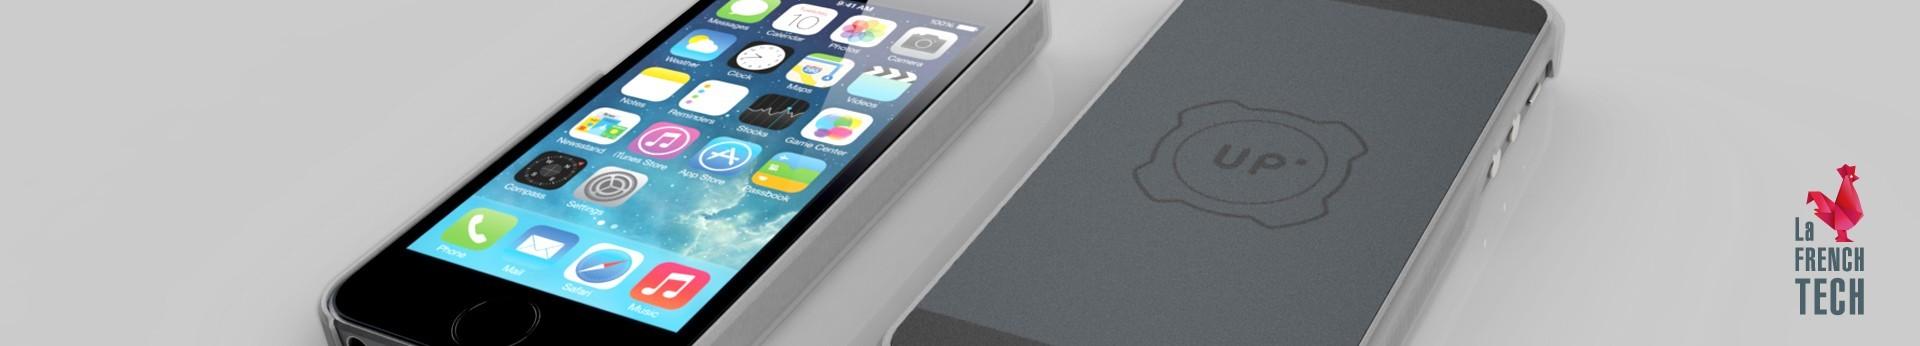 chargeur sans fil iphone 5 5s se exelium. Black Bedroom Furniture Sets. Home Design Ideas